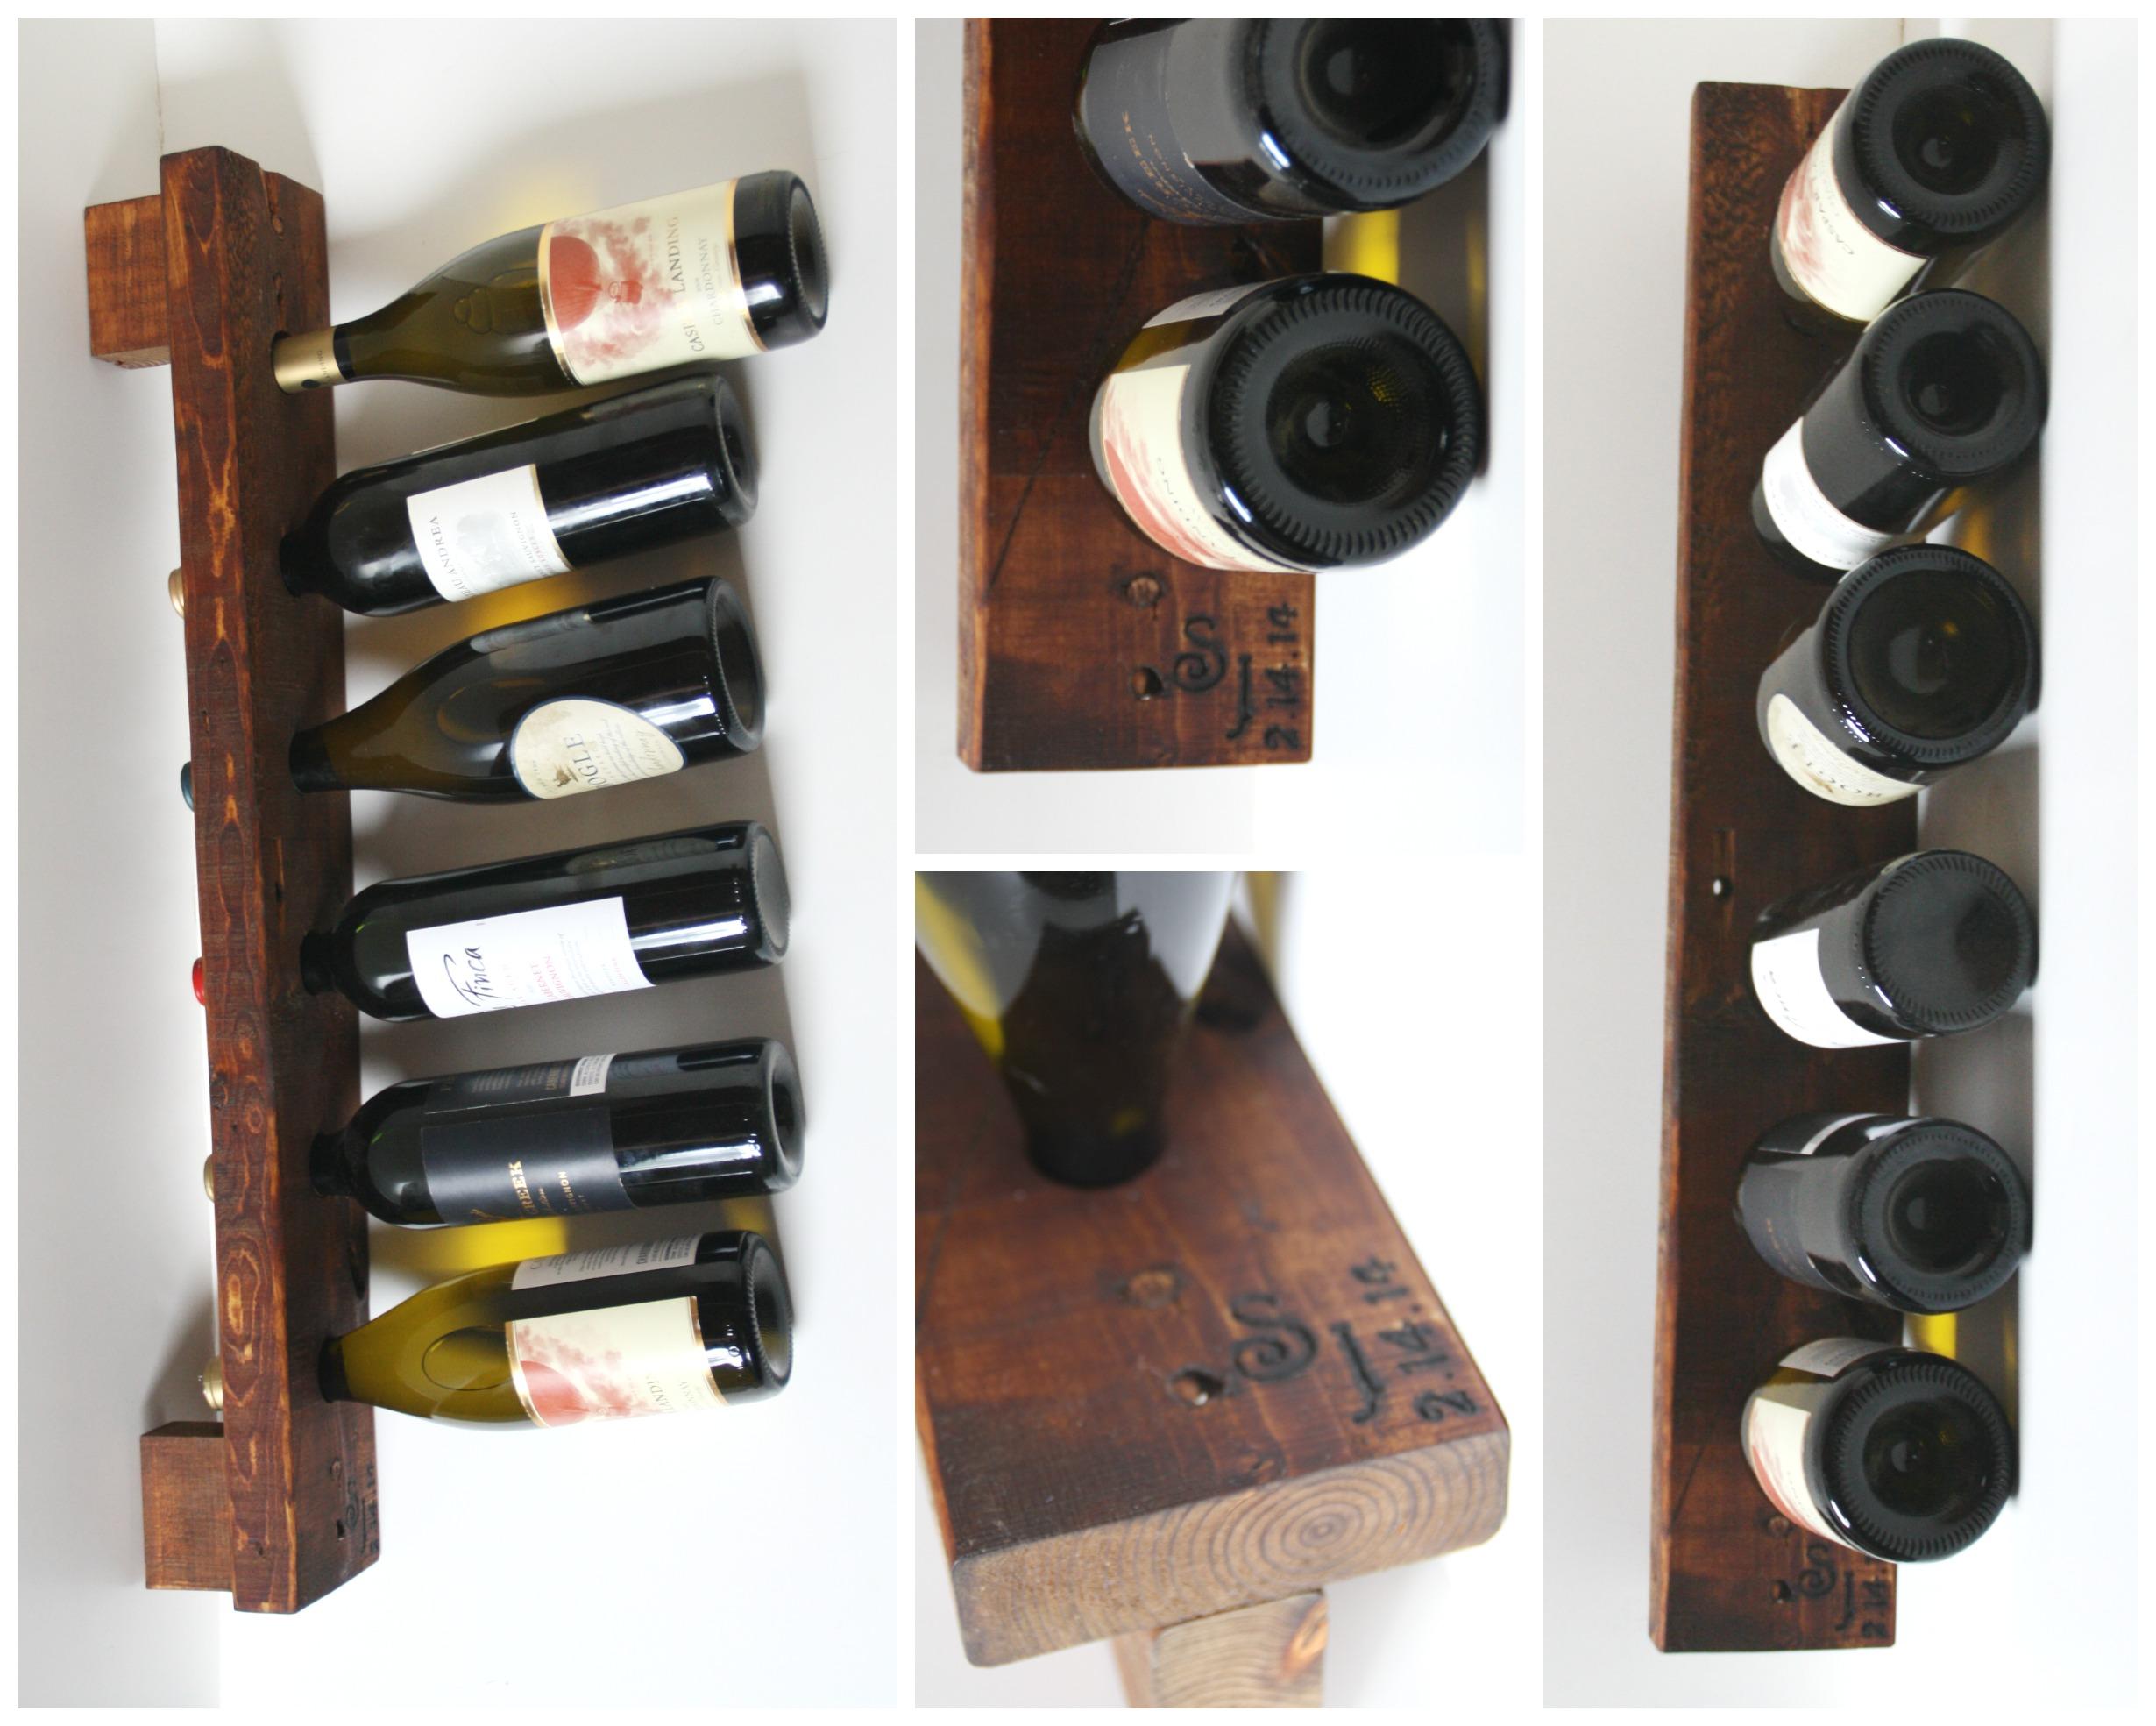 Wall Wine Rack Collage Straight 6 btl 2-22-14.jpg